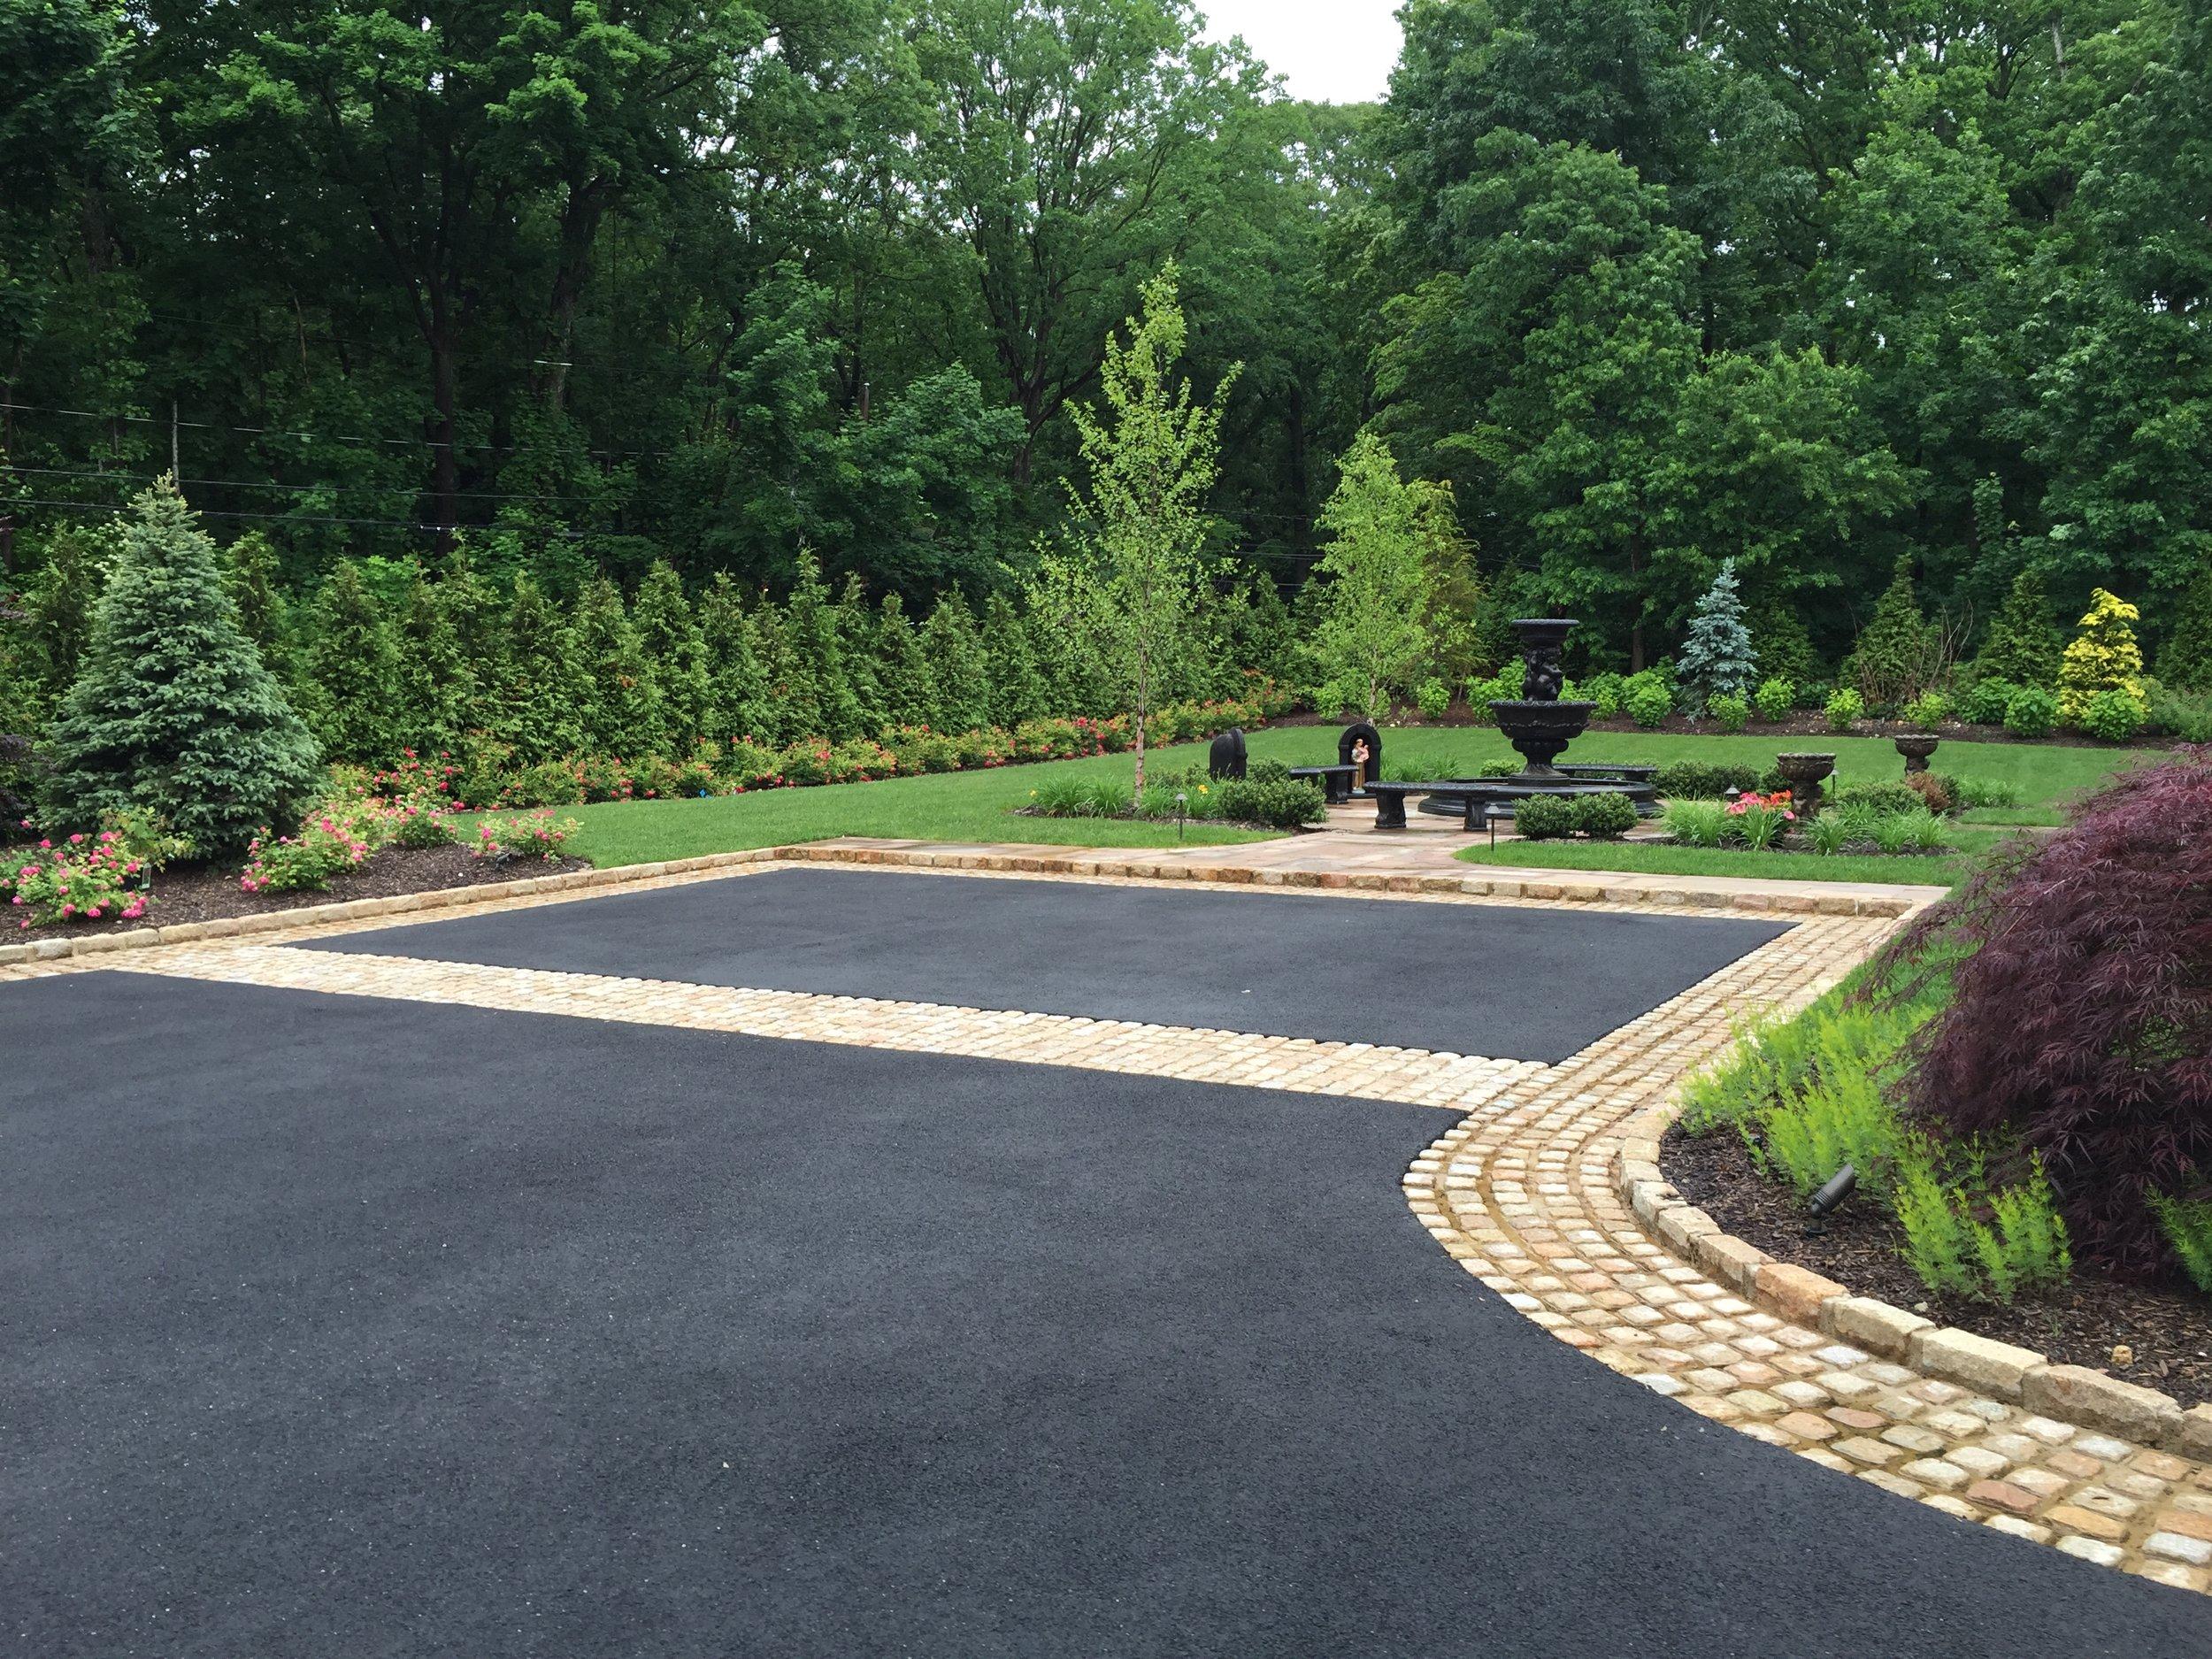 Top driveway paver company in Long Island, NY